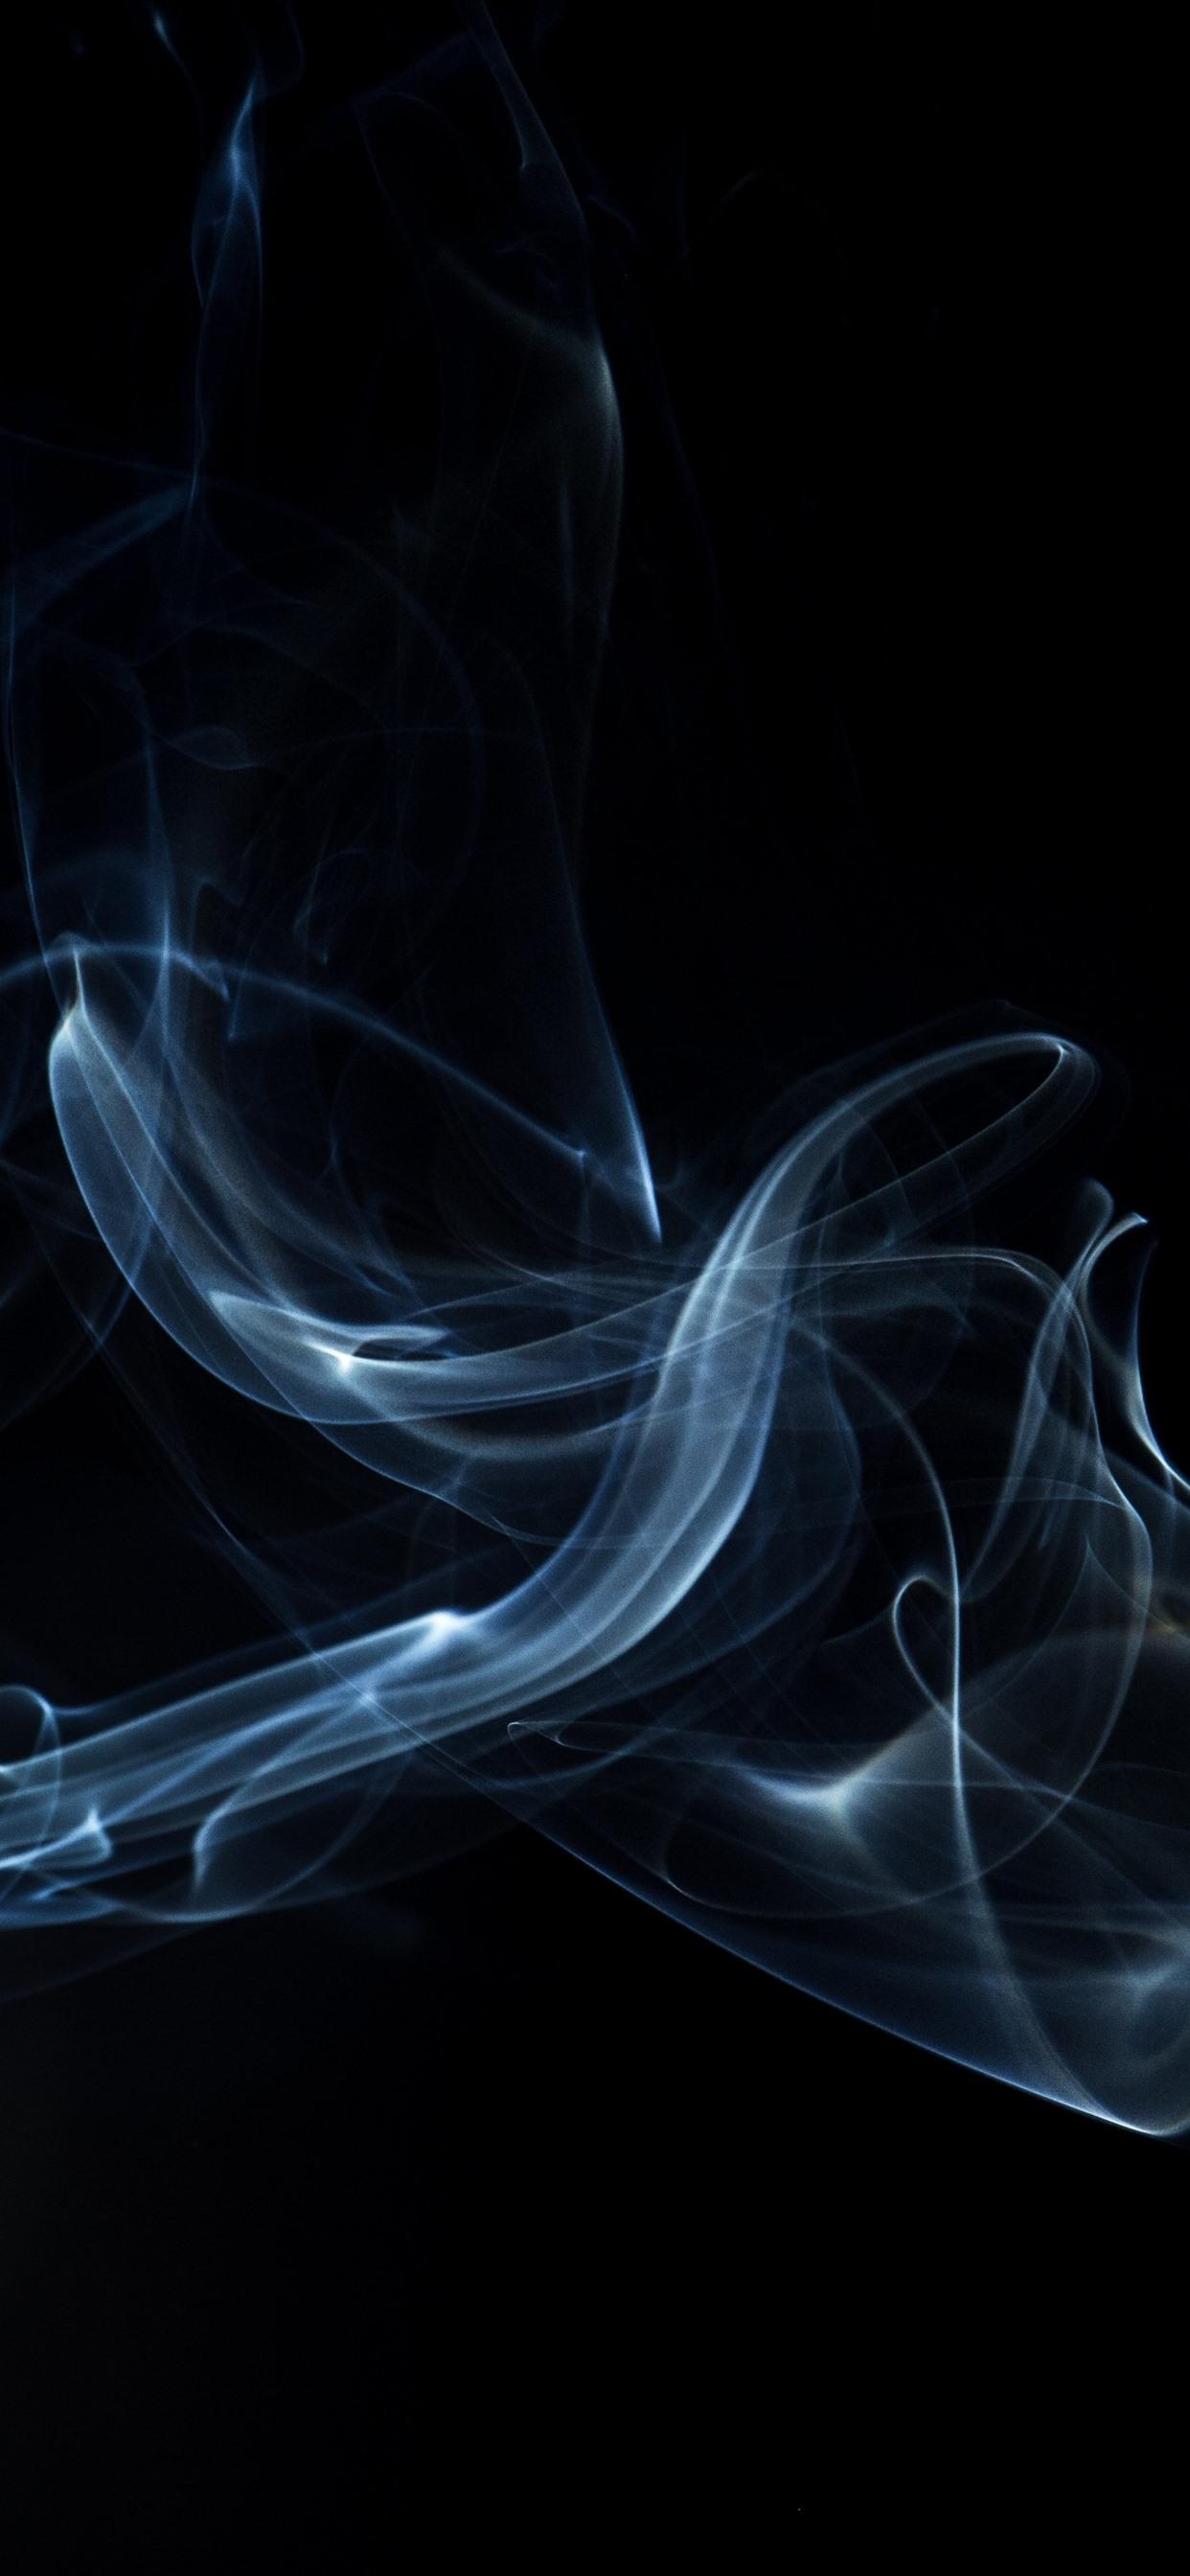 Wallpaper Smoke Darkness 5120x2880 Uhd 5k Picture Image